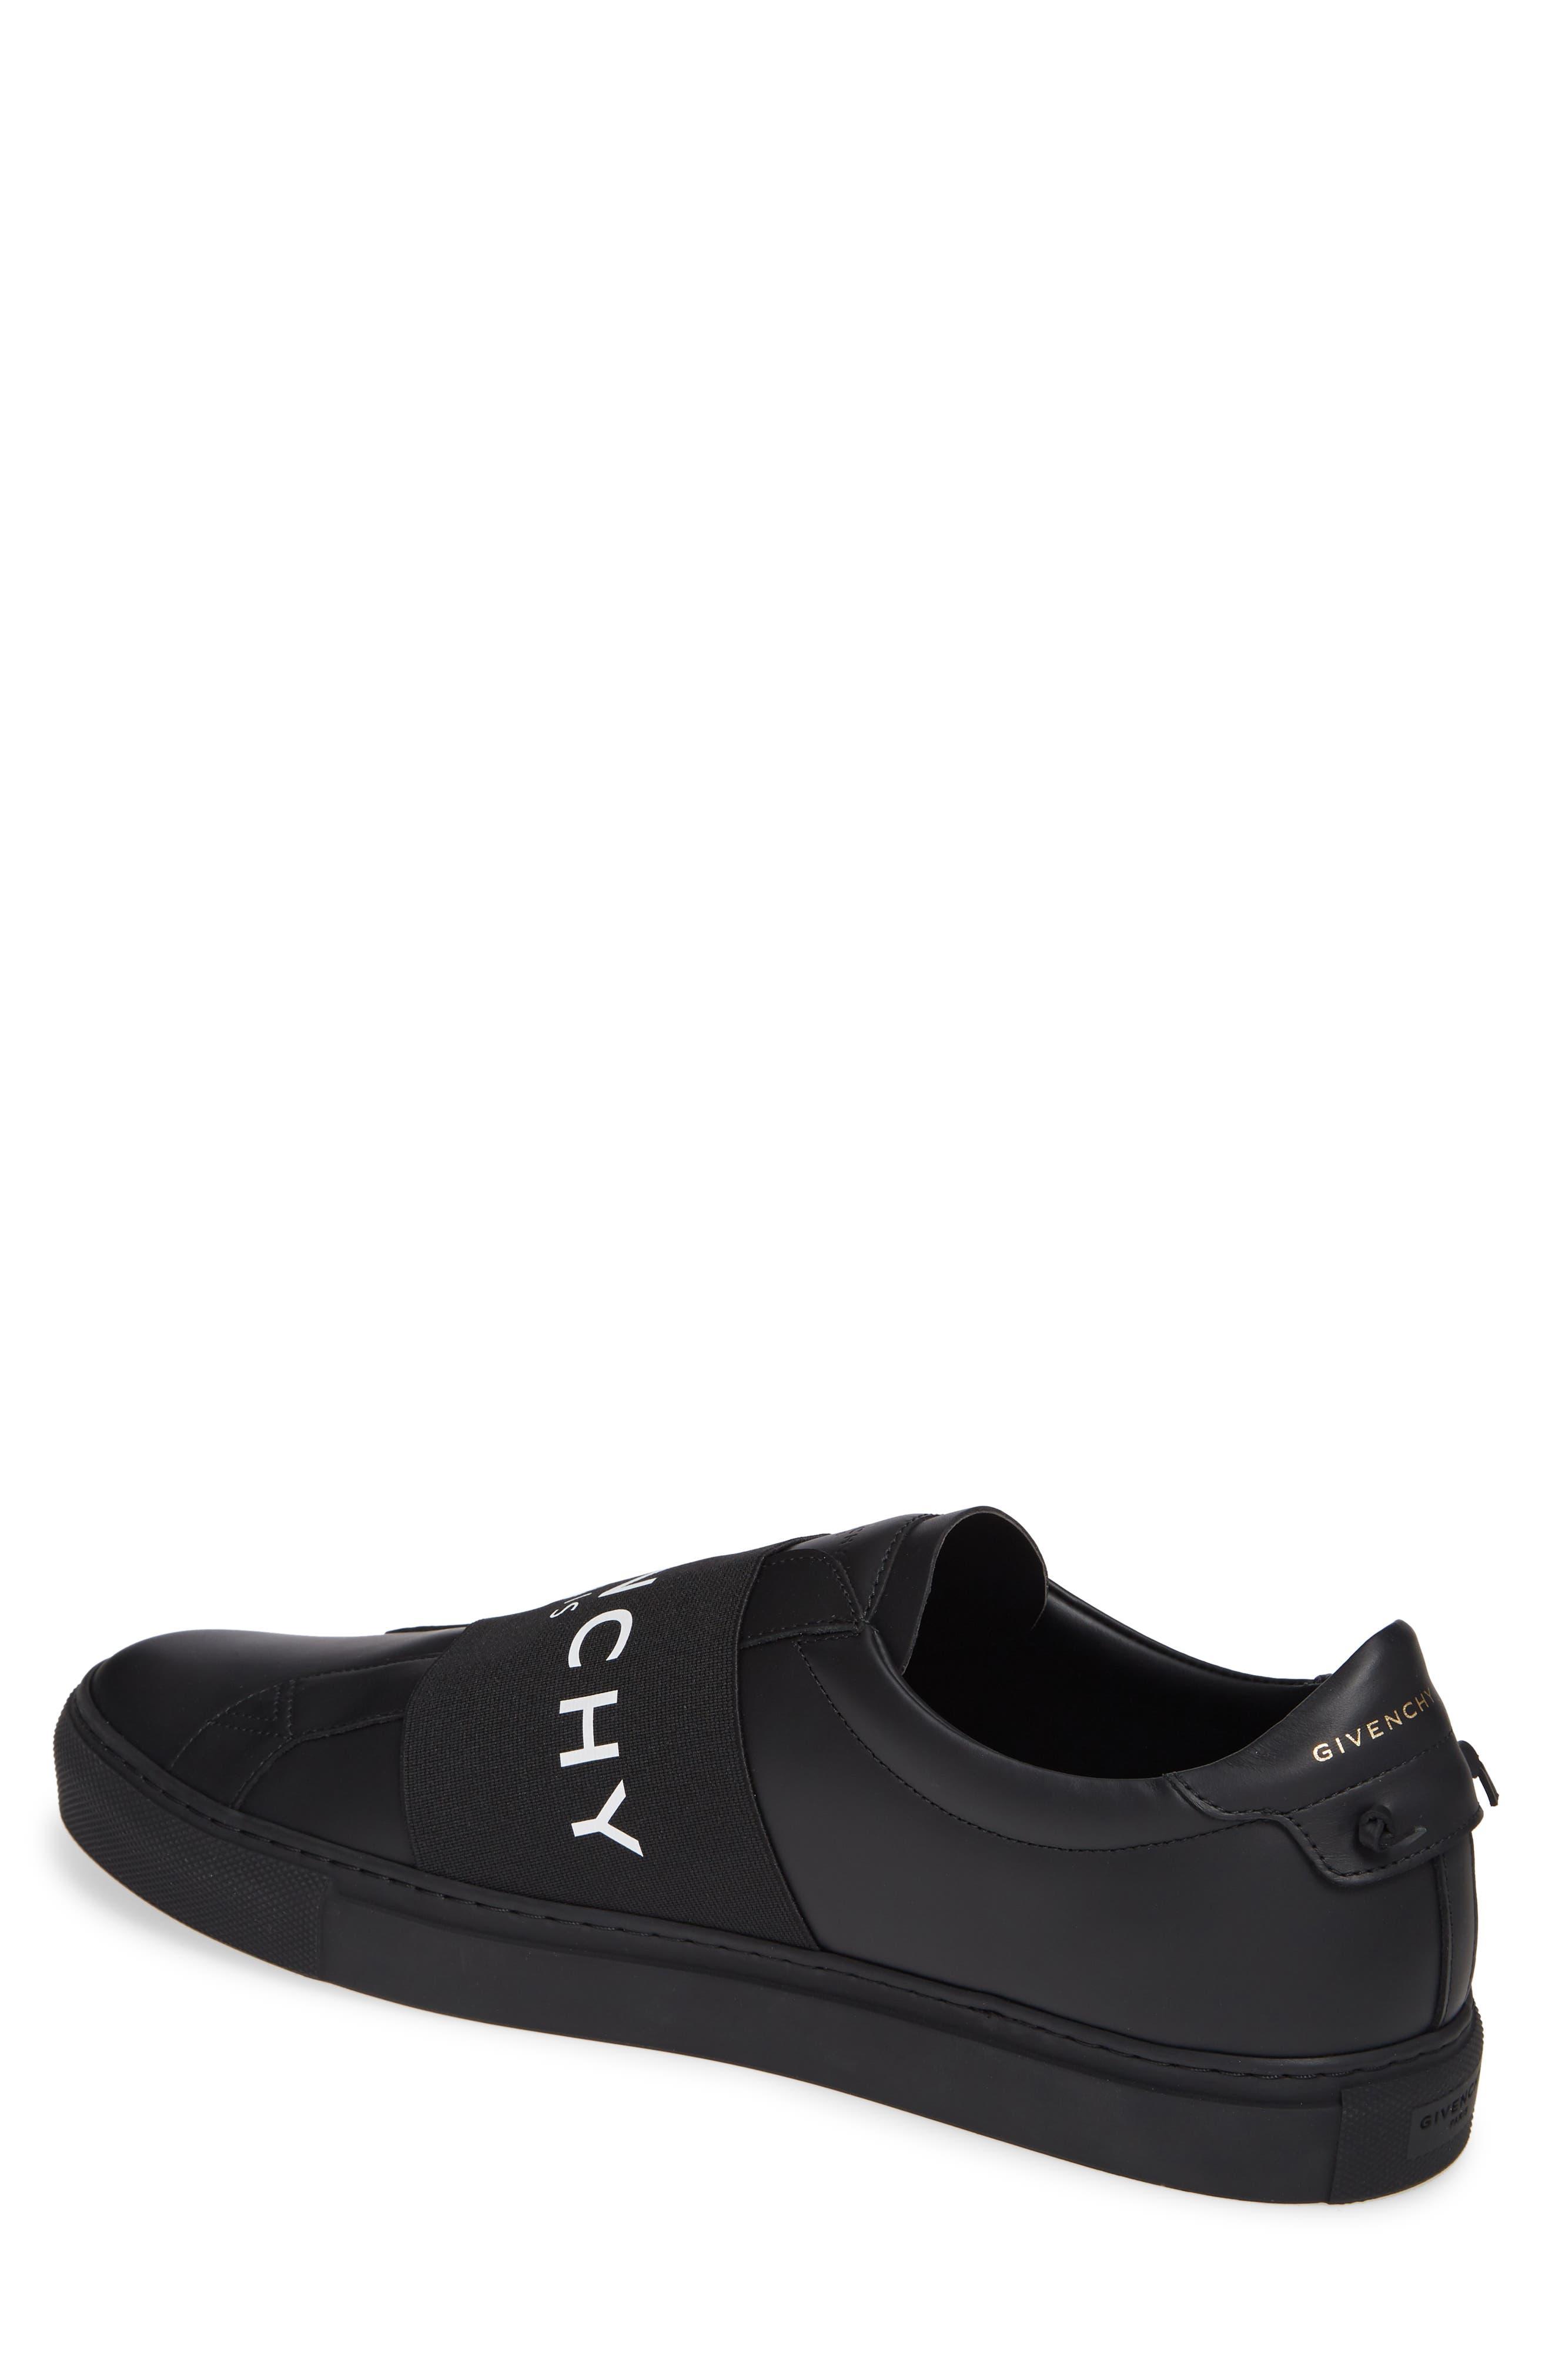 GIVENCHY, Urban Knots Sneaker, Alternate thumbnail 2, color, BLACK